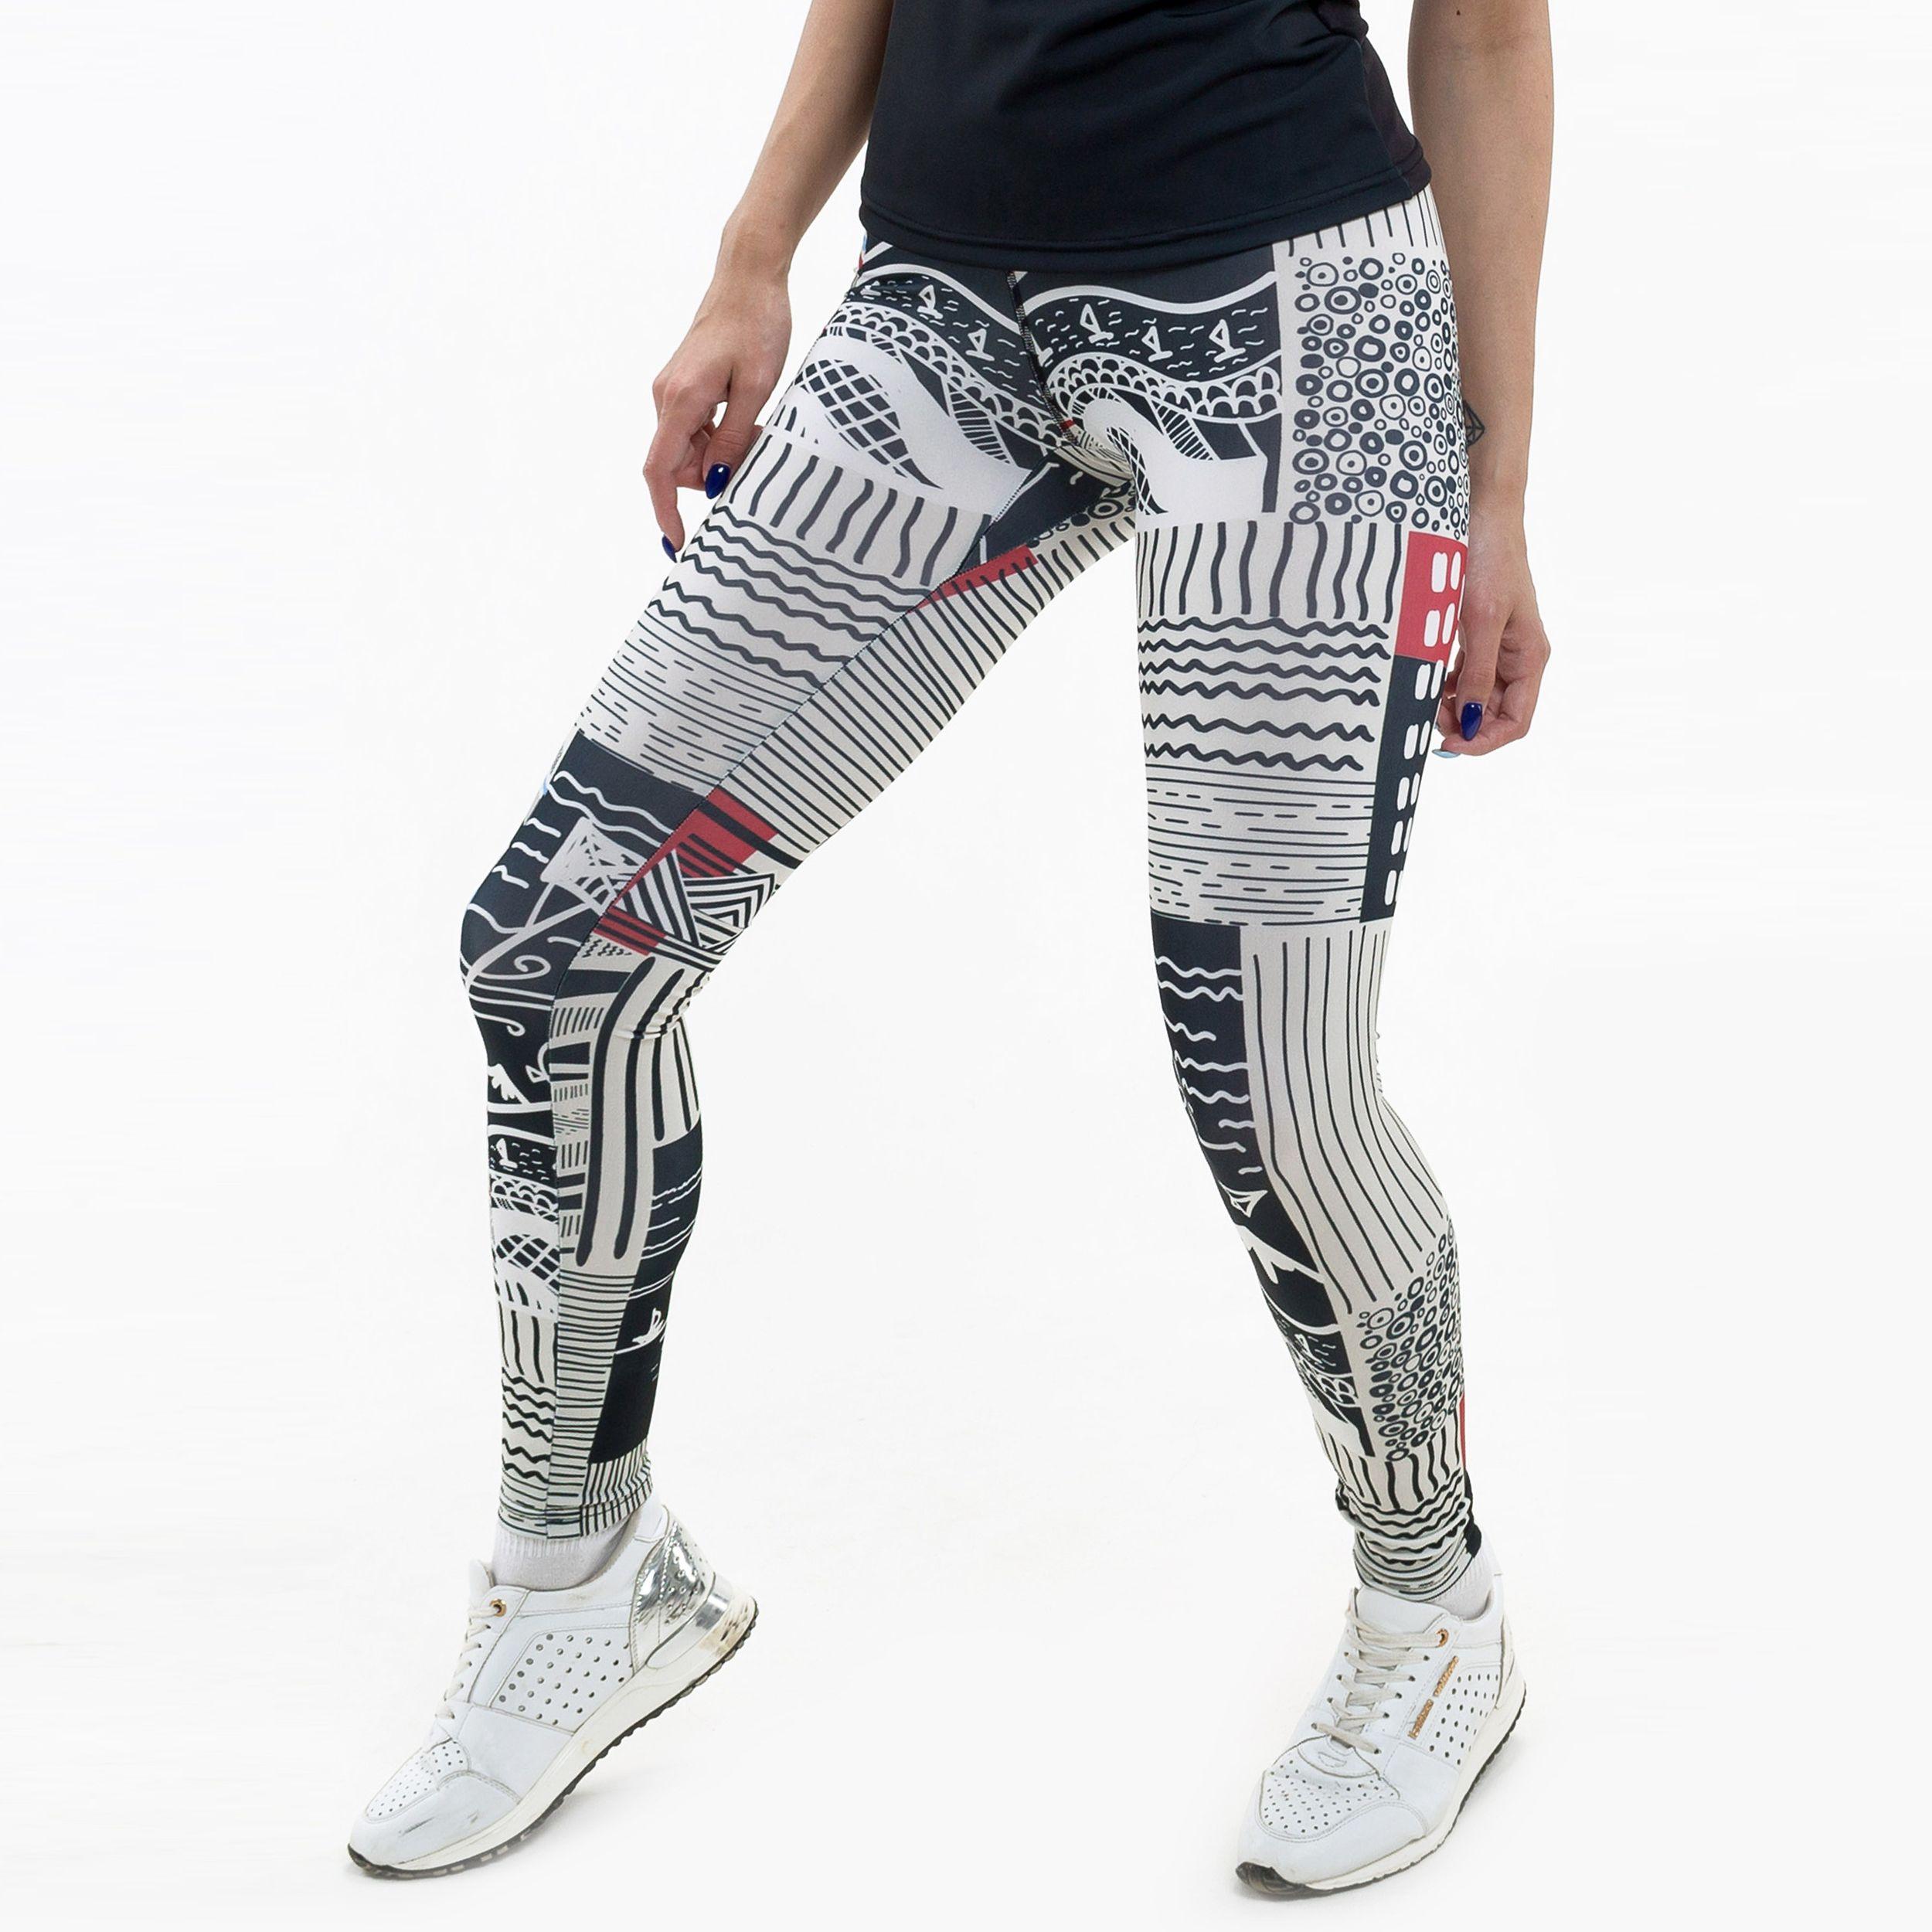 SUN SPORT Women's Leggings ZOZH